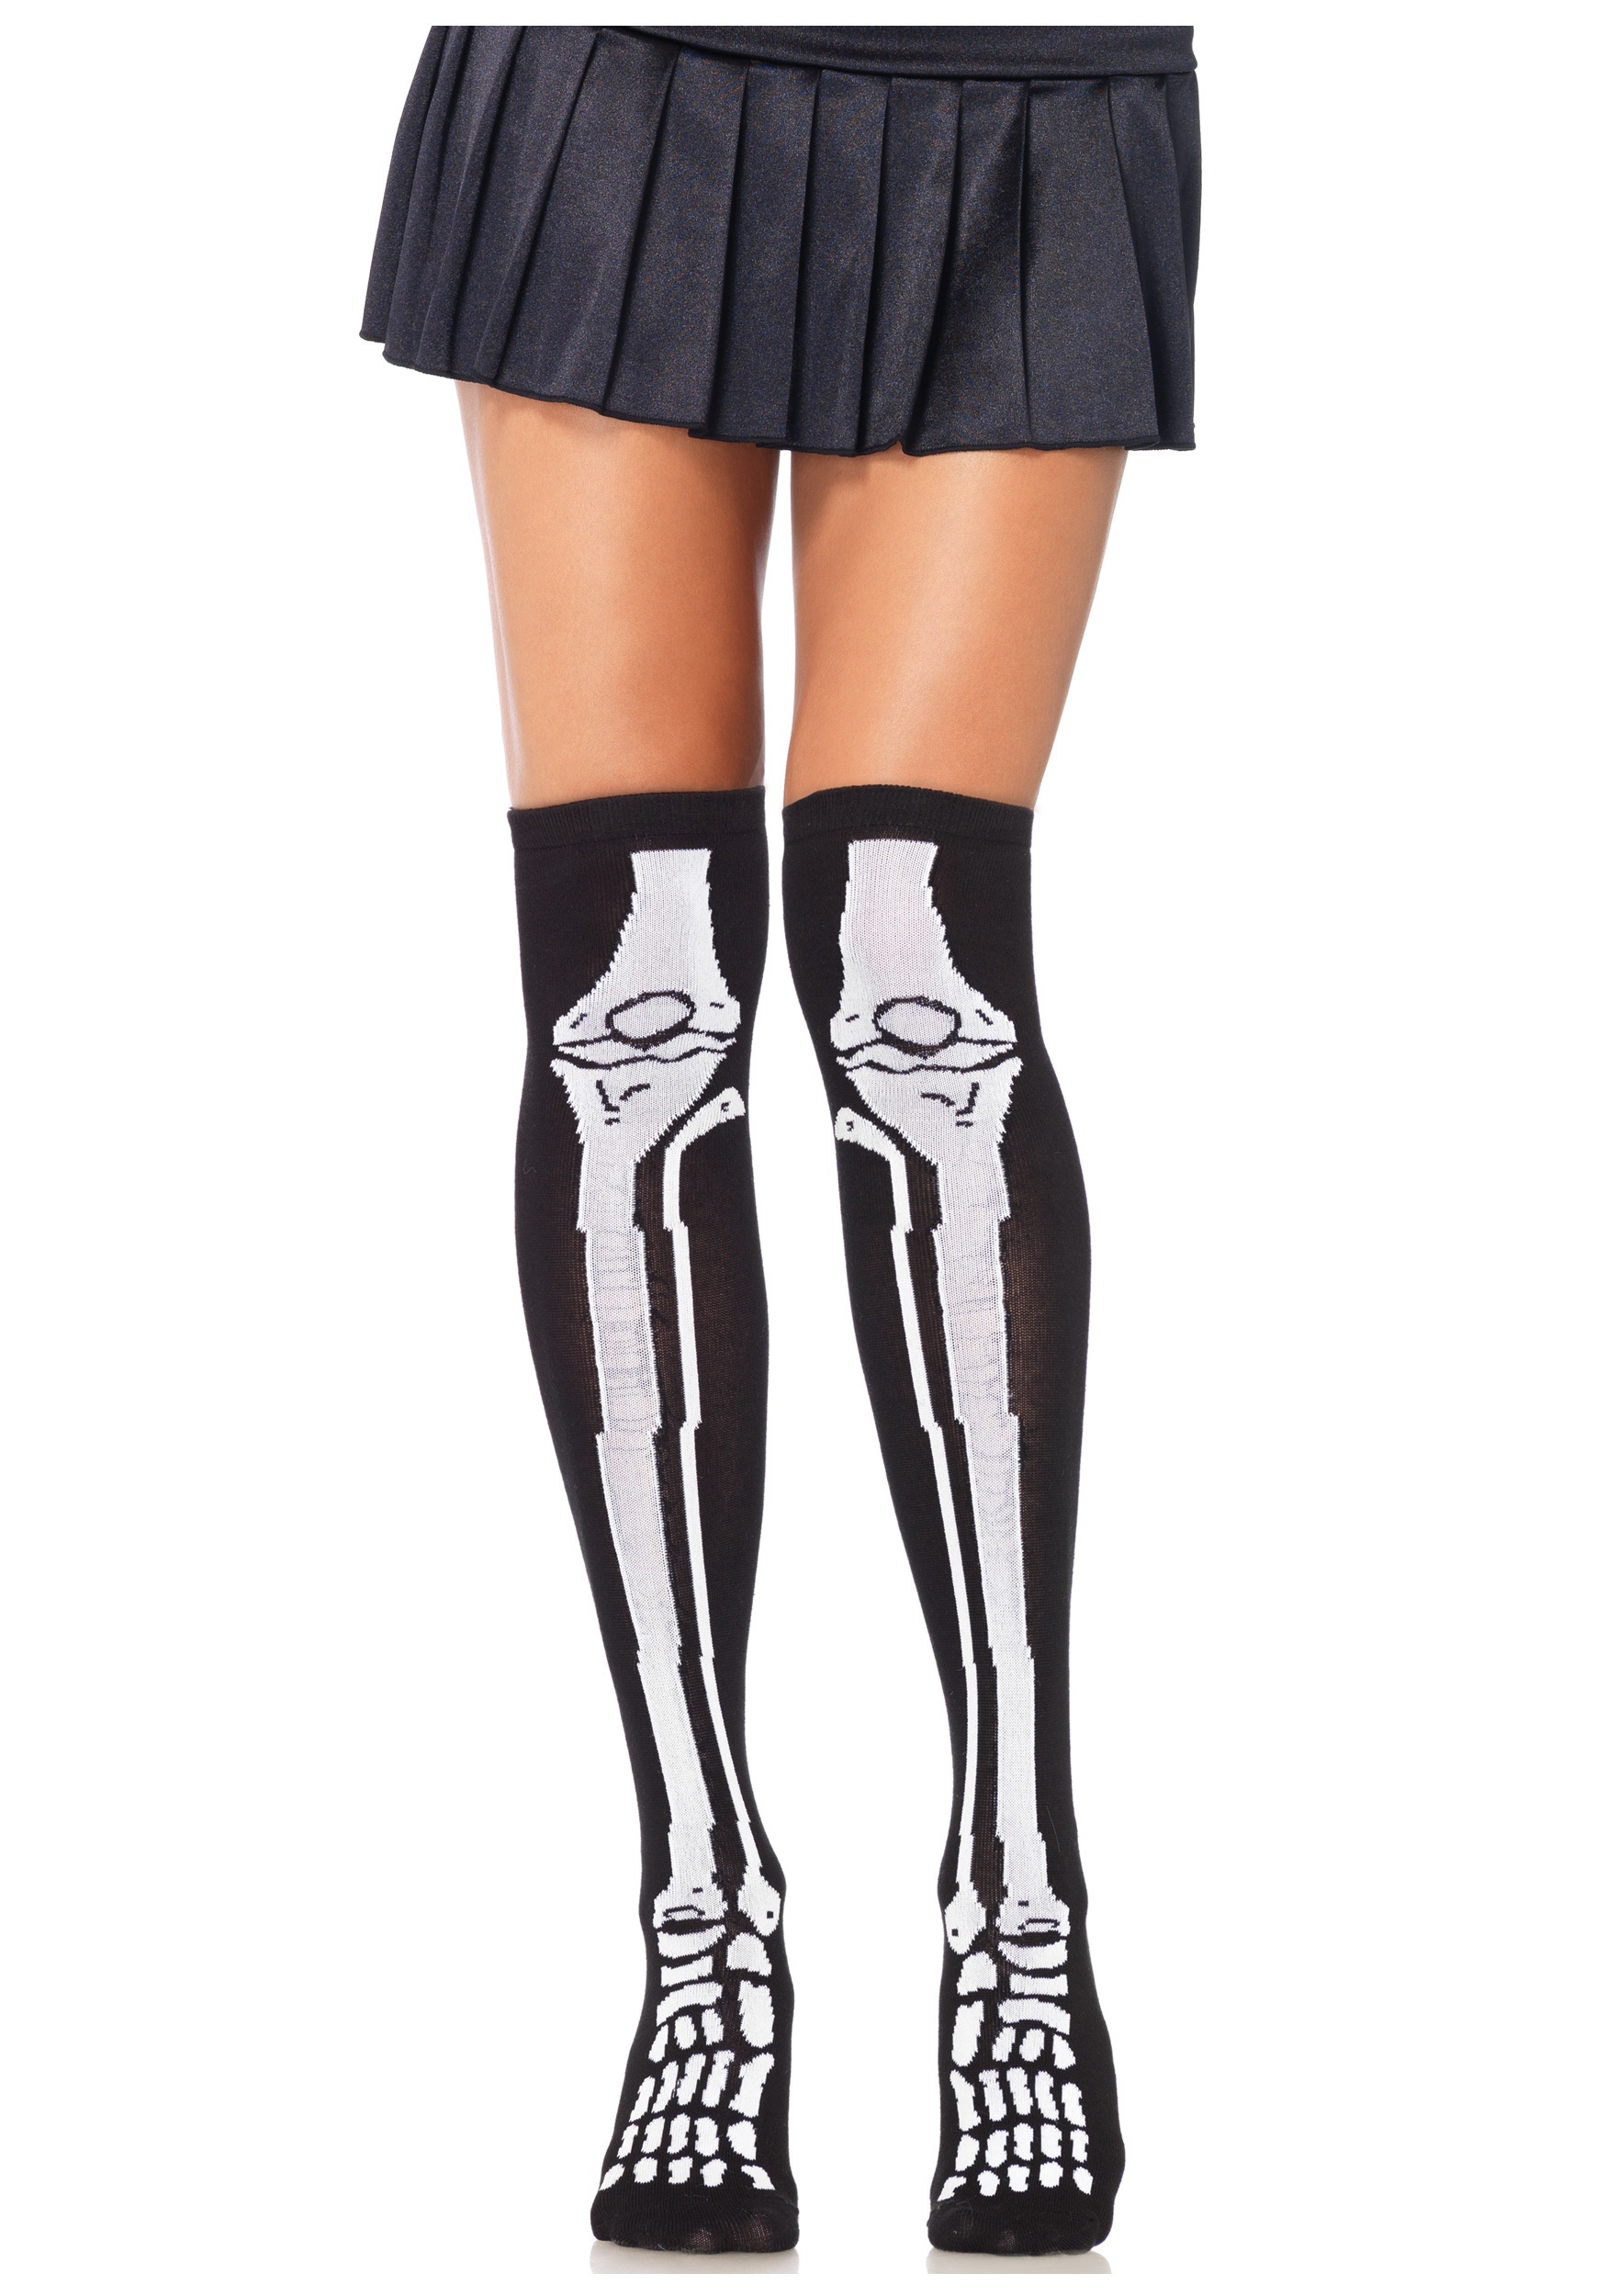 eadfaa714 skeleton-knee-high-socks.jpg